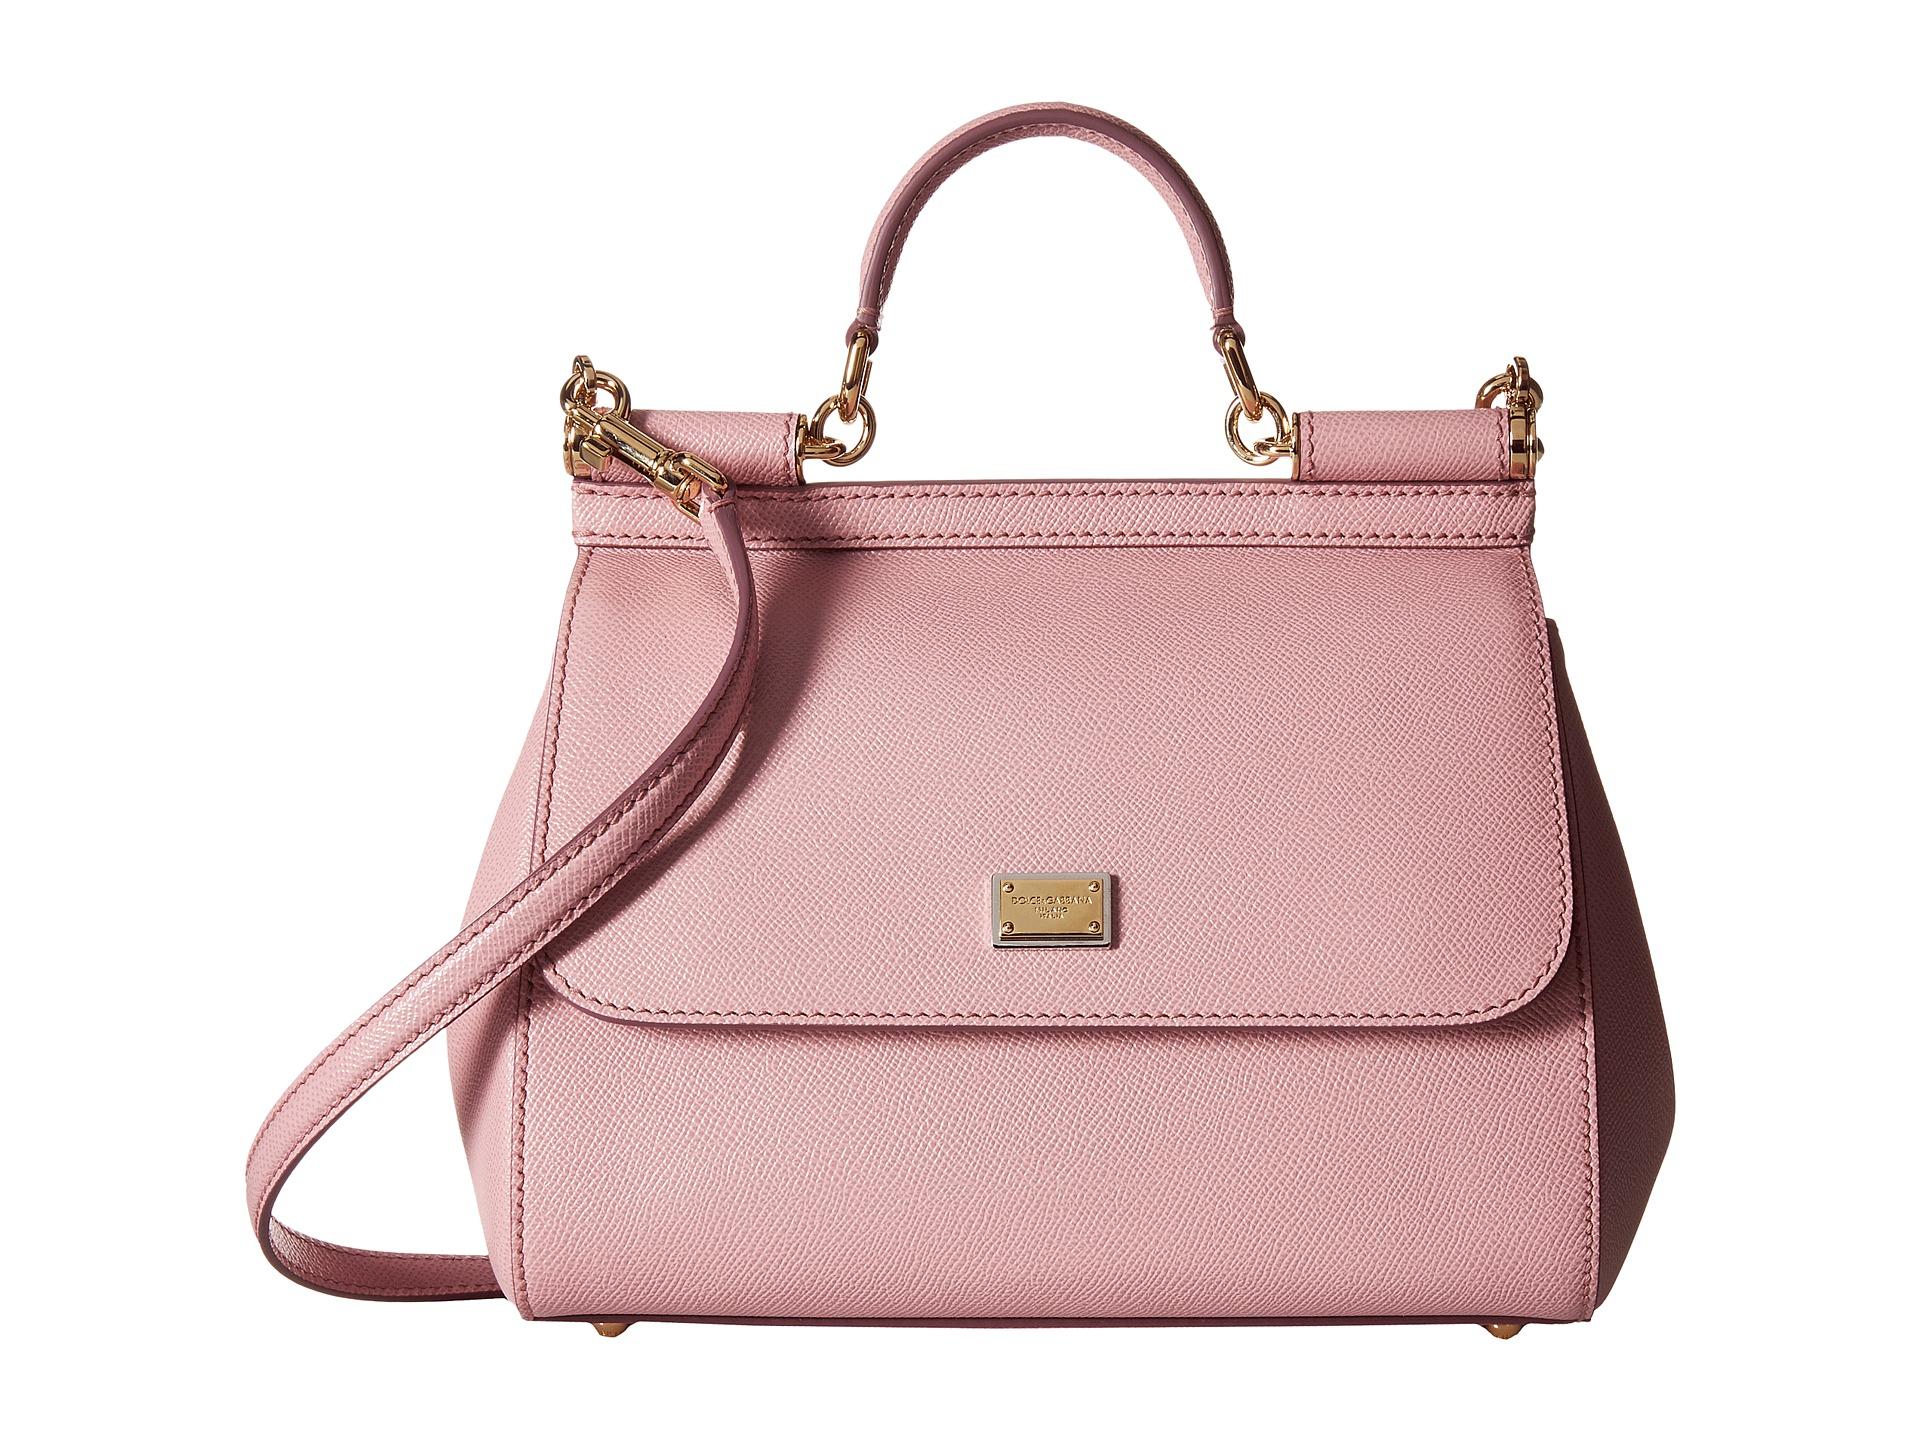 1d09c35299 Lyst - Dolce   Gabbana Borsa A Mano Vitello Stampa Dauphine in Pink